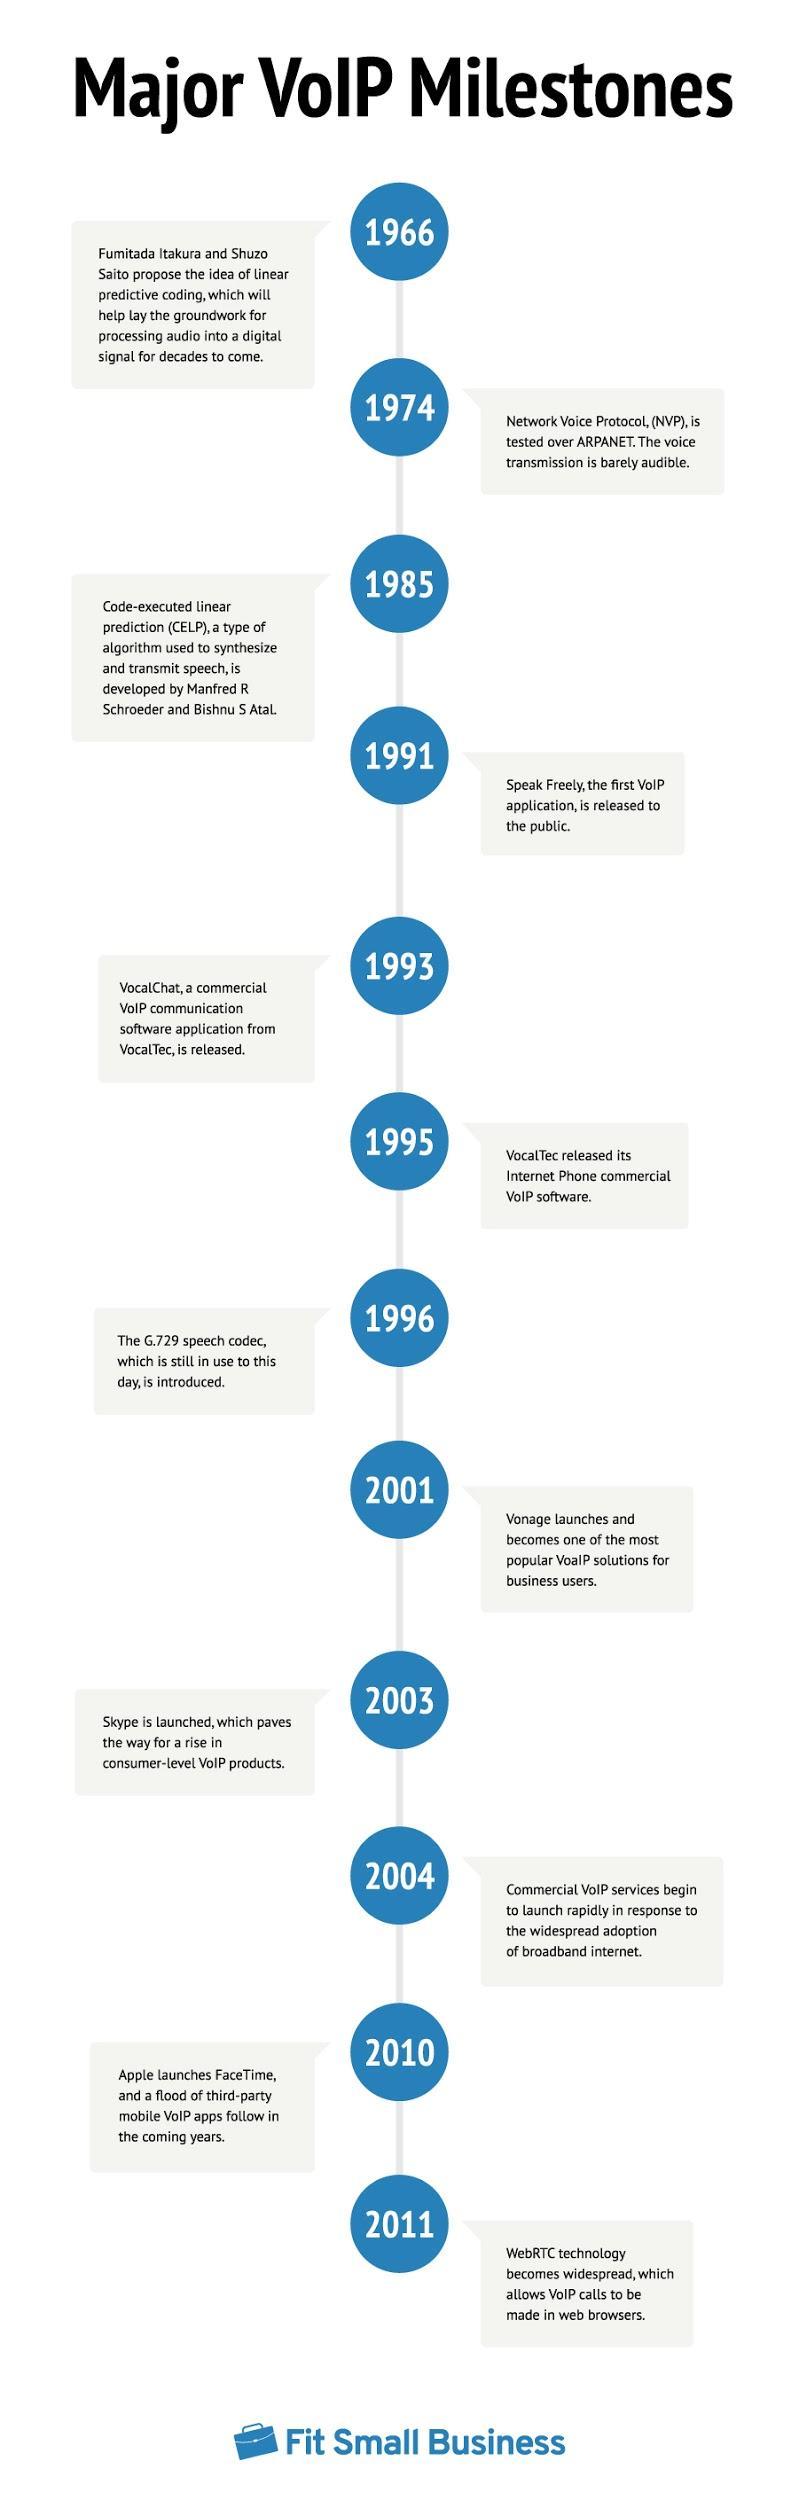 VoIP Milestones